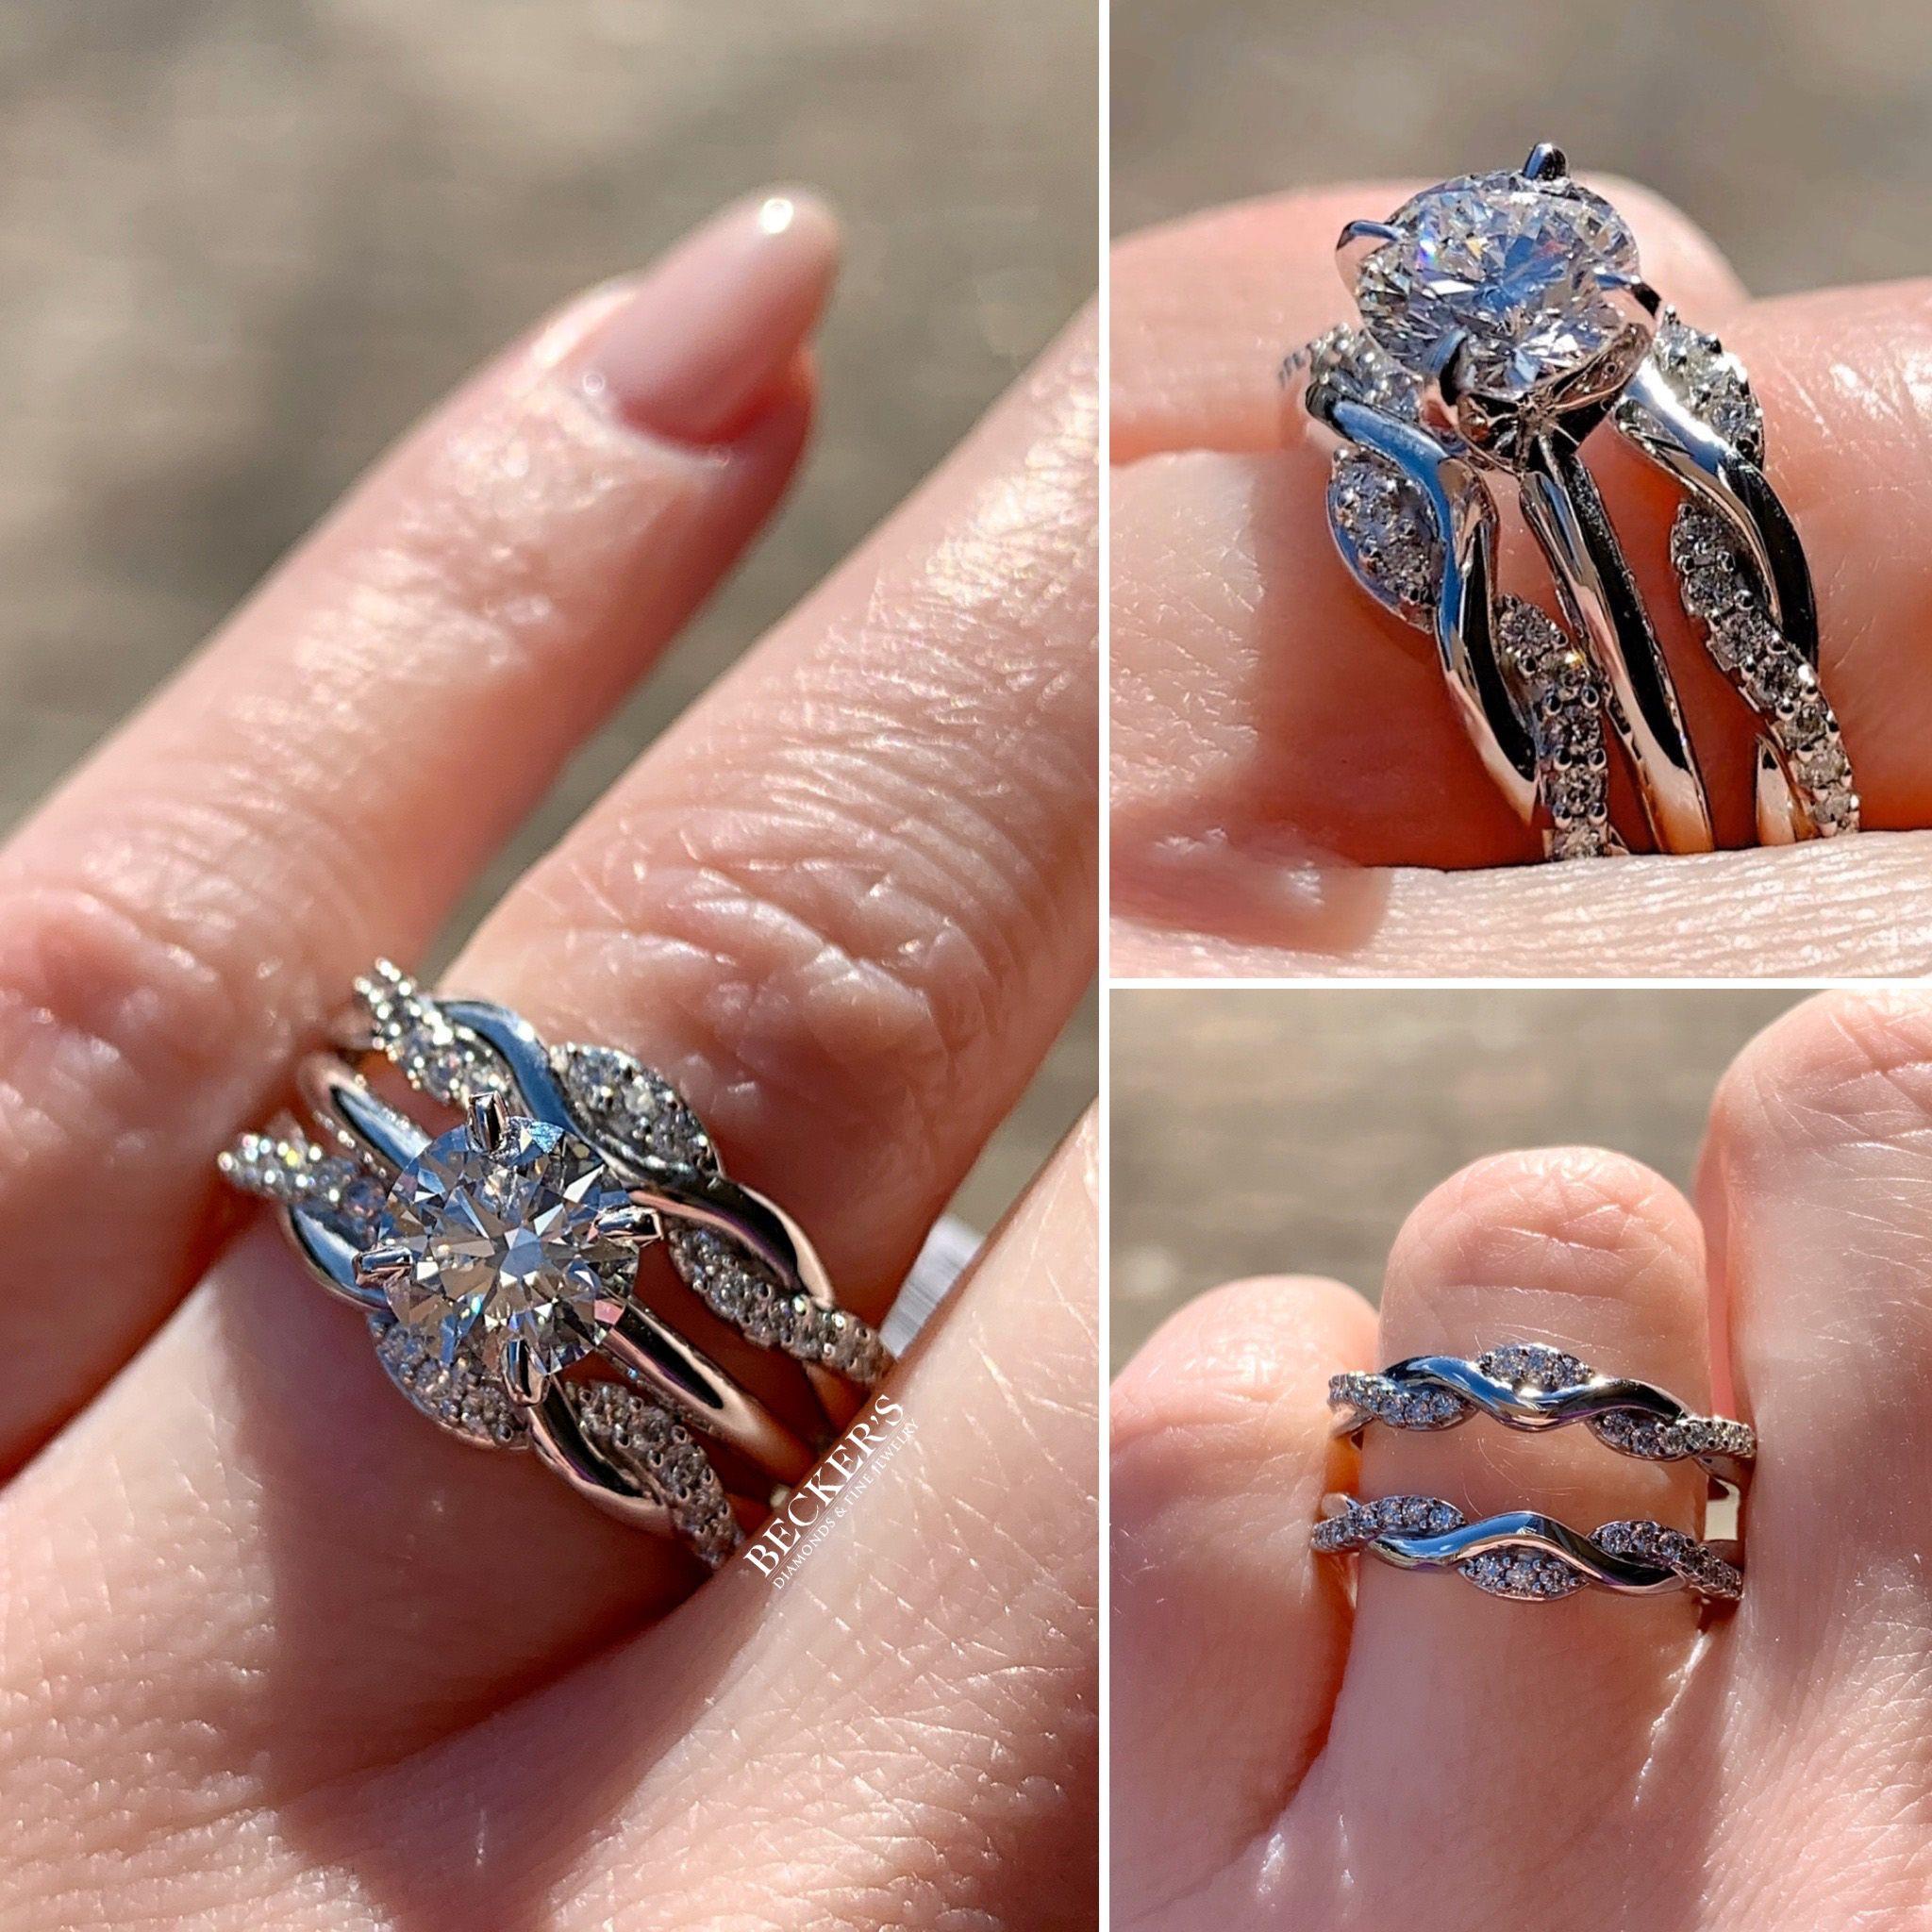 Jacket Enhancer Wedding Band In 2020 Wedding Ring Bands Anniversary Ring Set Enhancer Wedding Band